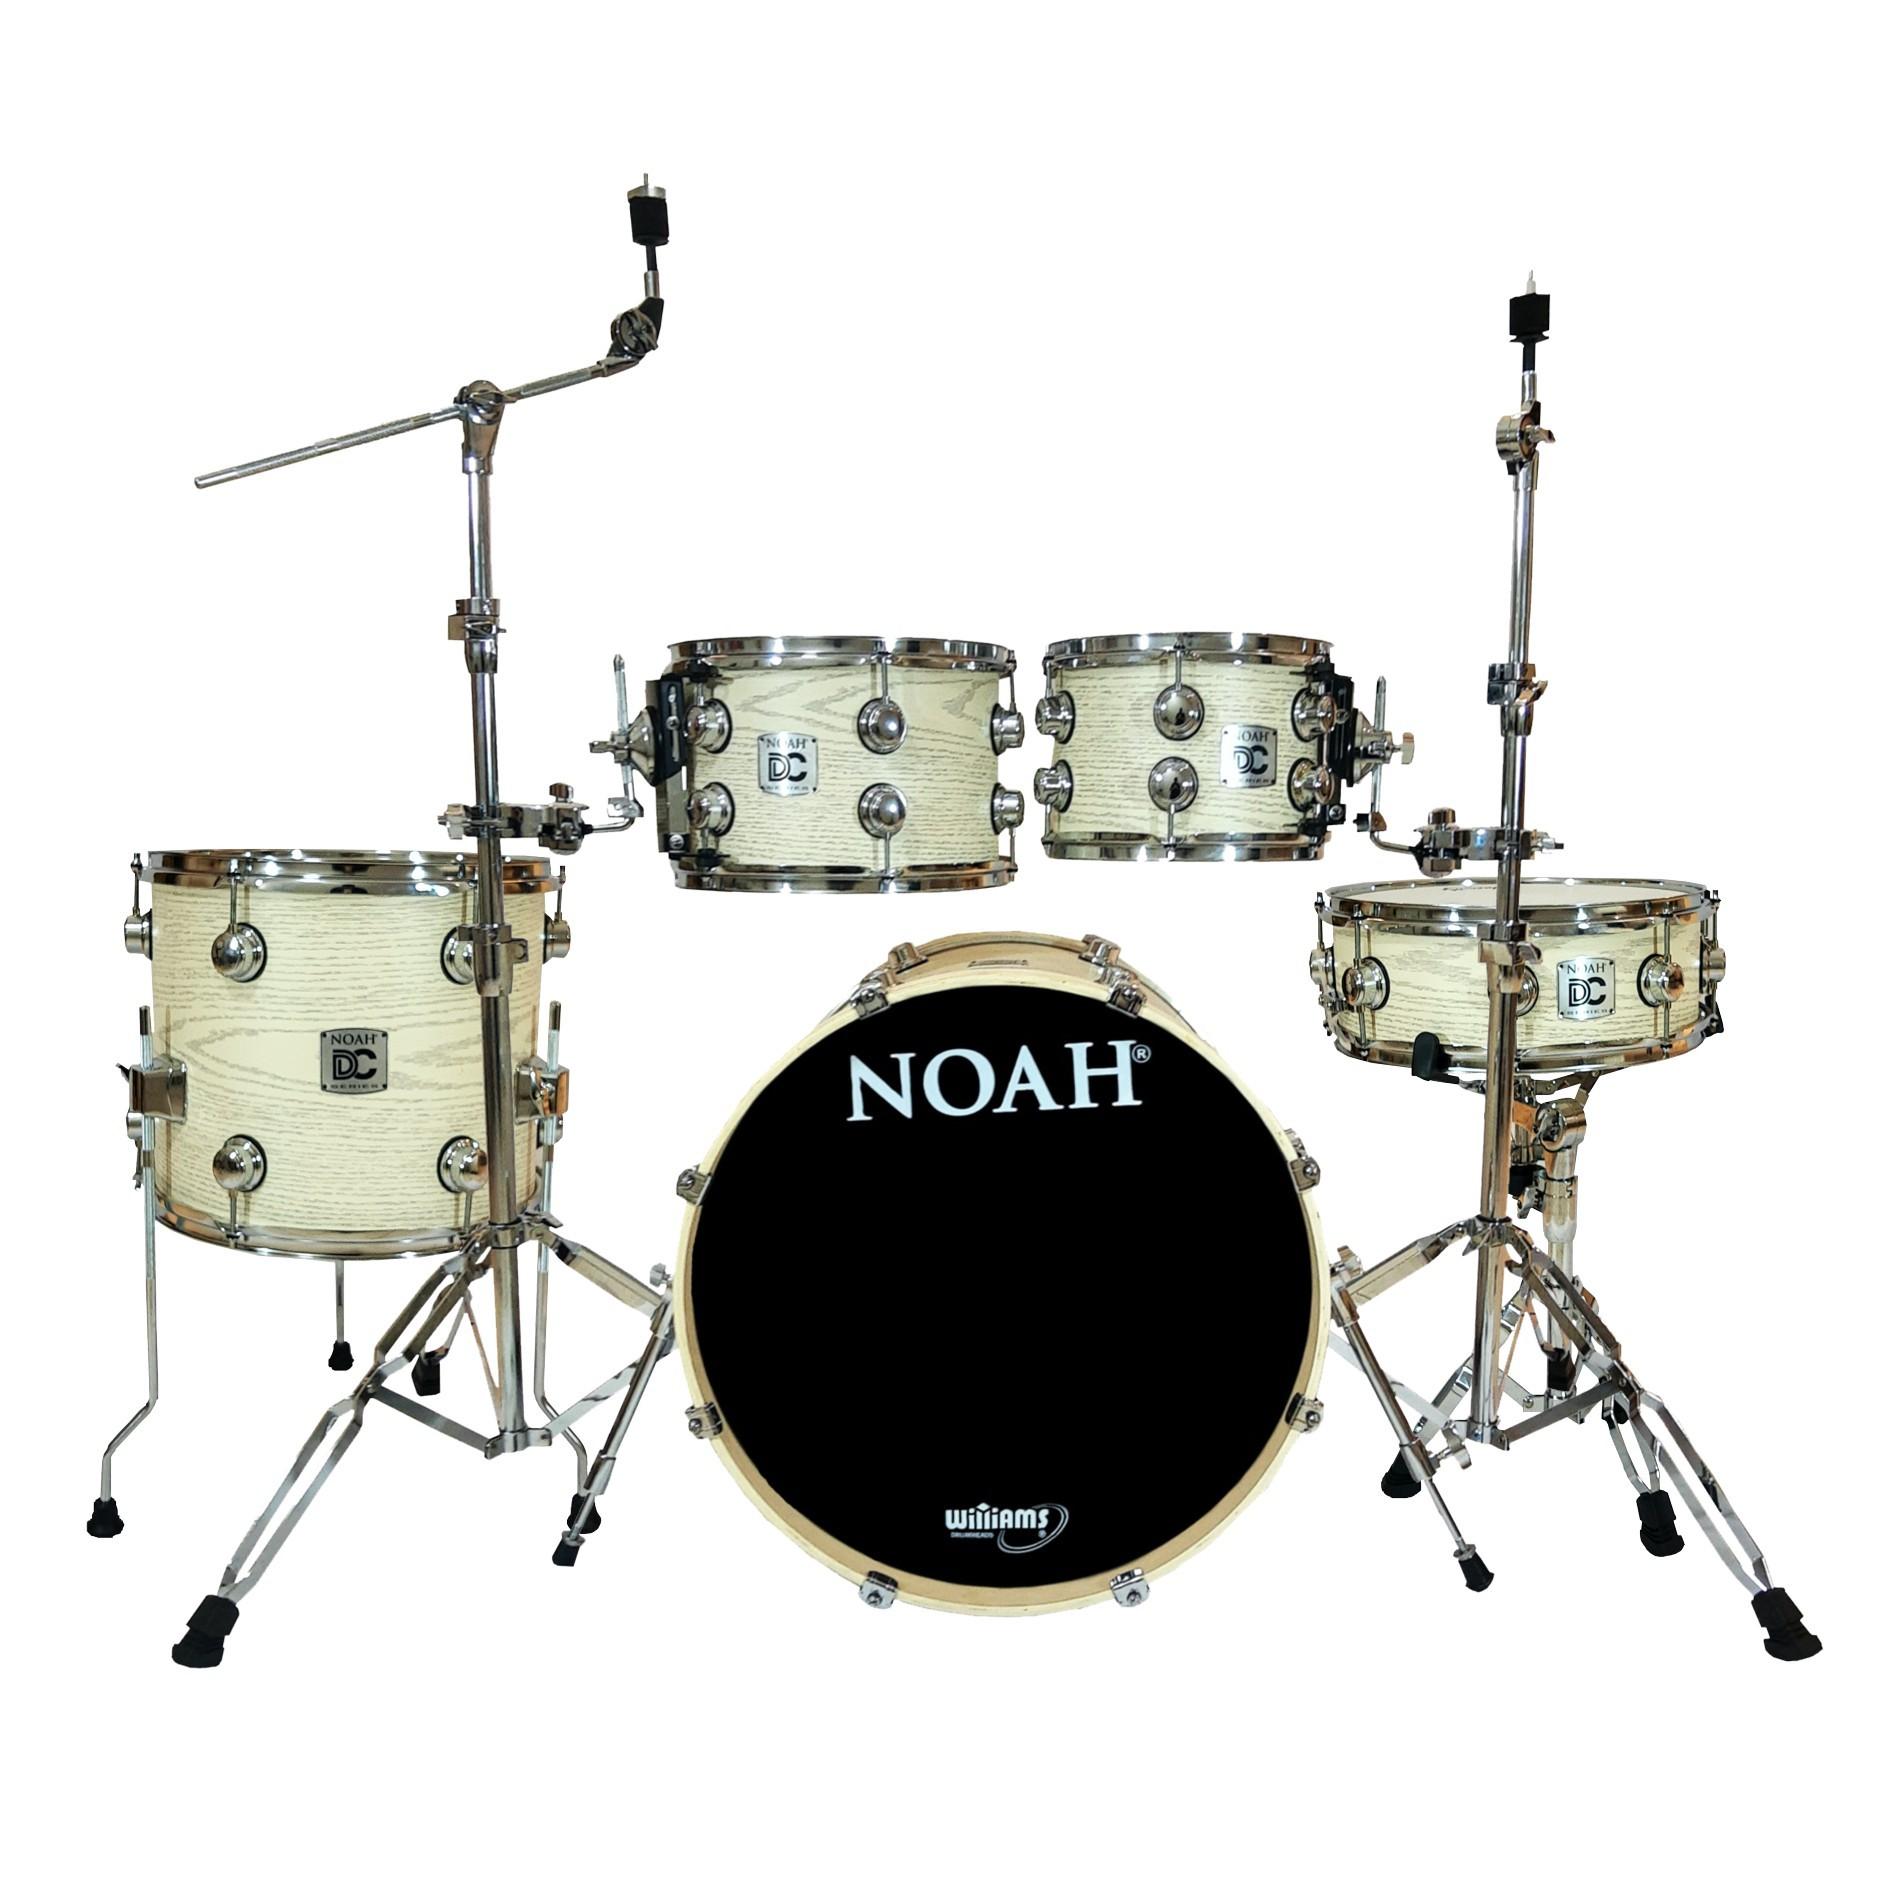 Bateria Acústica Noah Dc5 Bumbo 20 Completa White Cloud